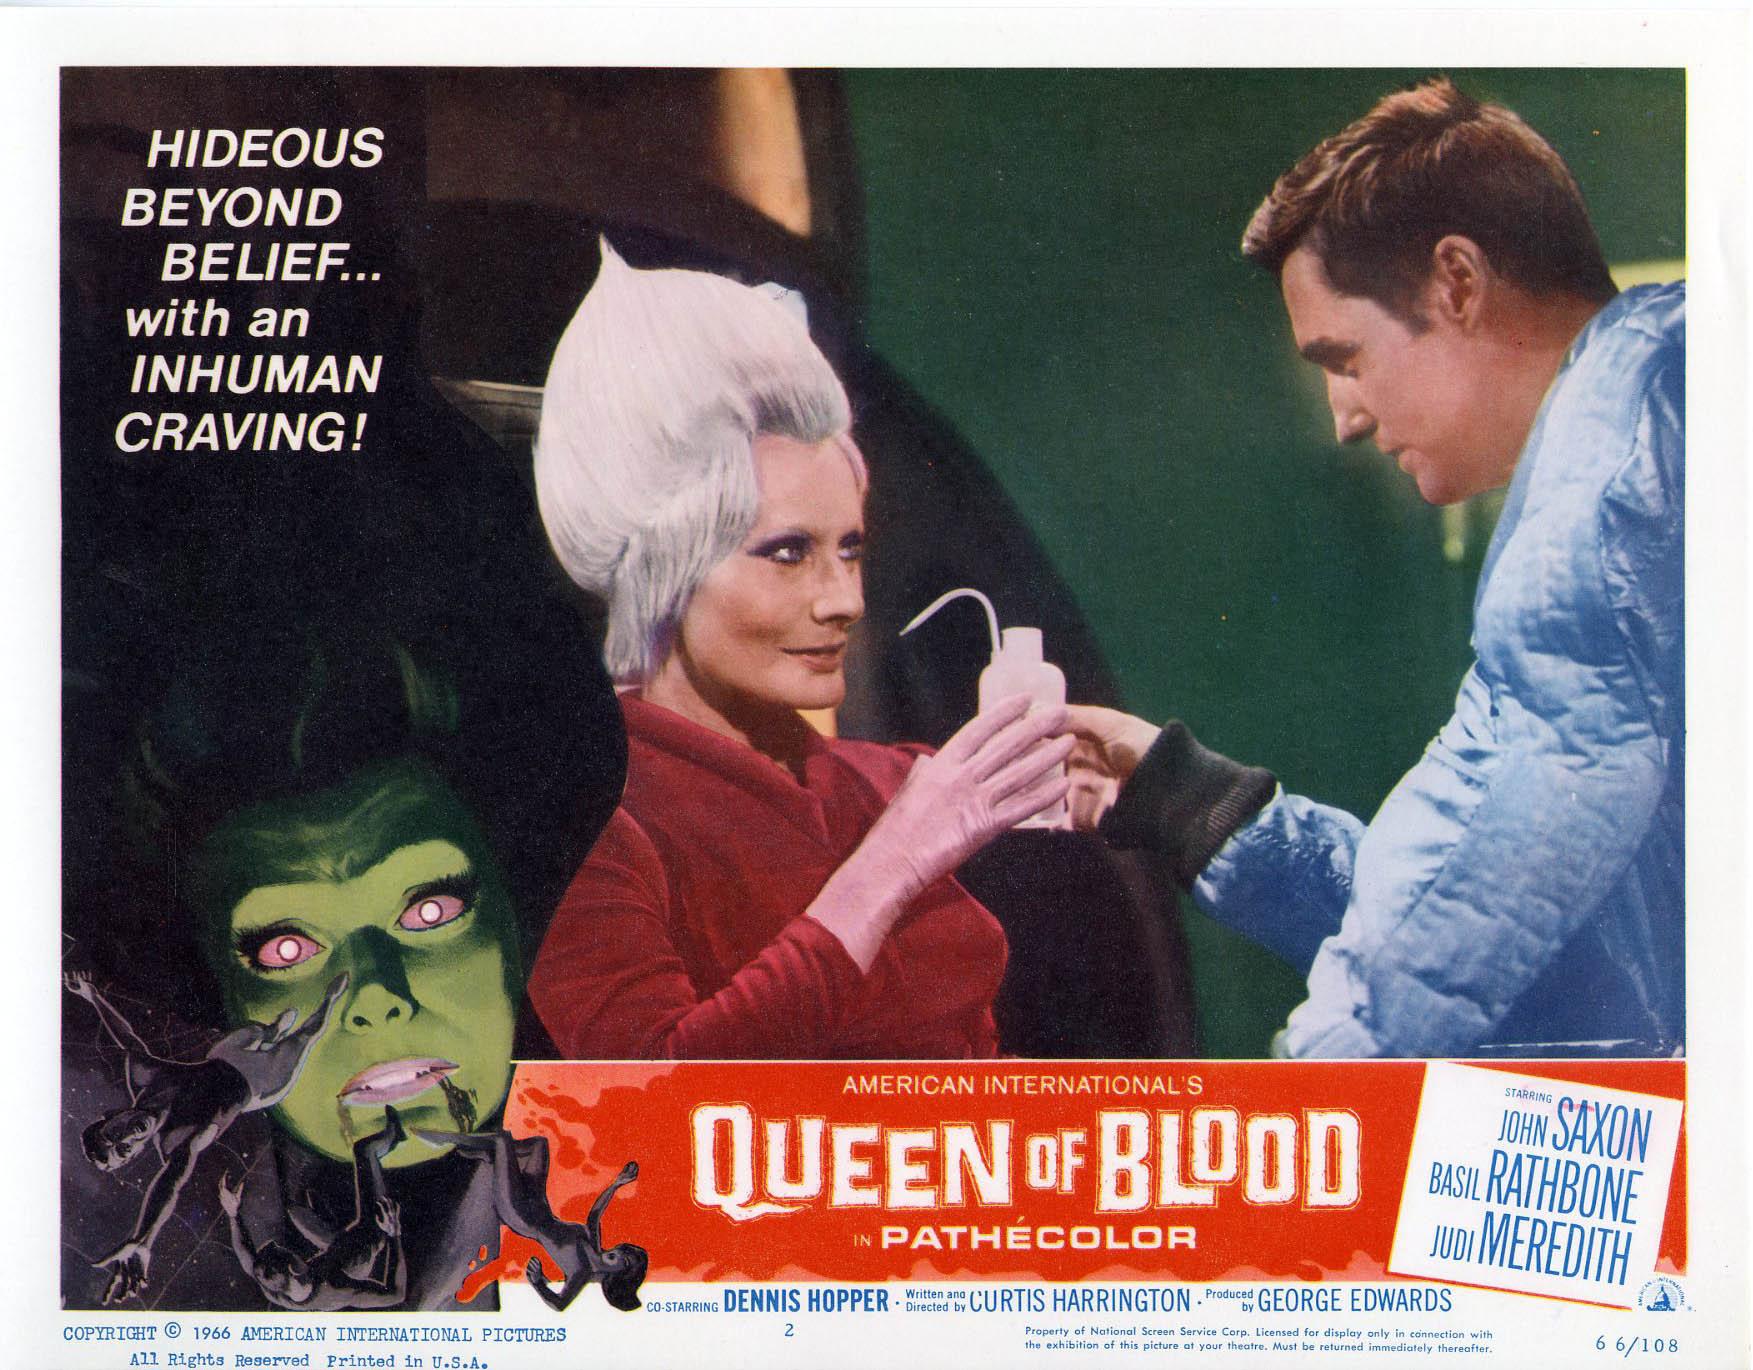 Queen of blood John Saxon Horror movie poster print #2